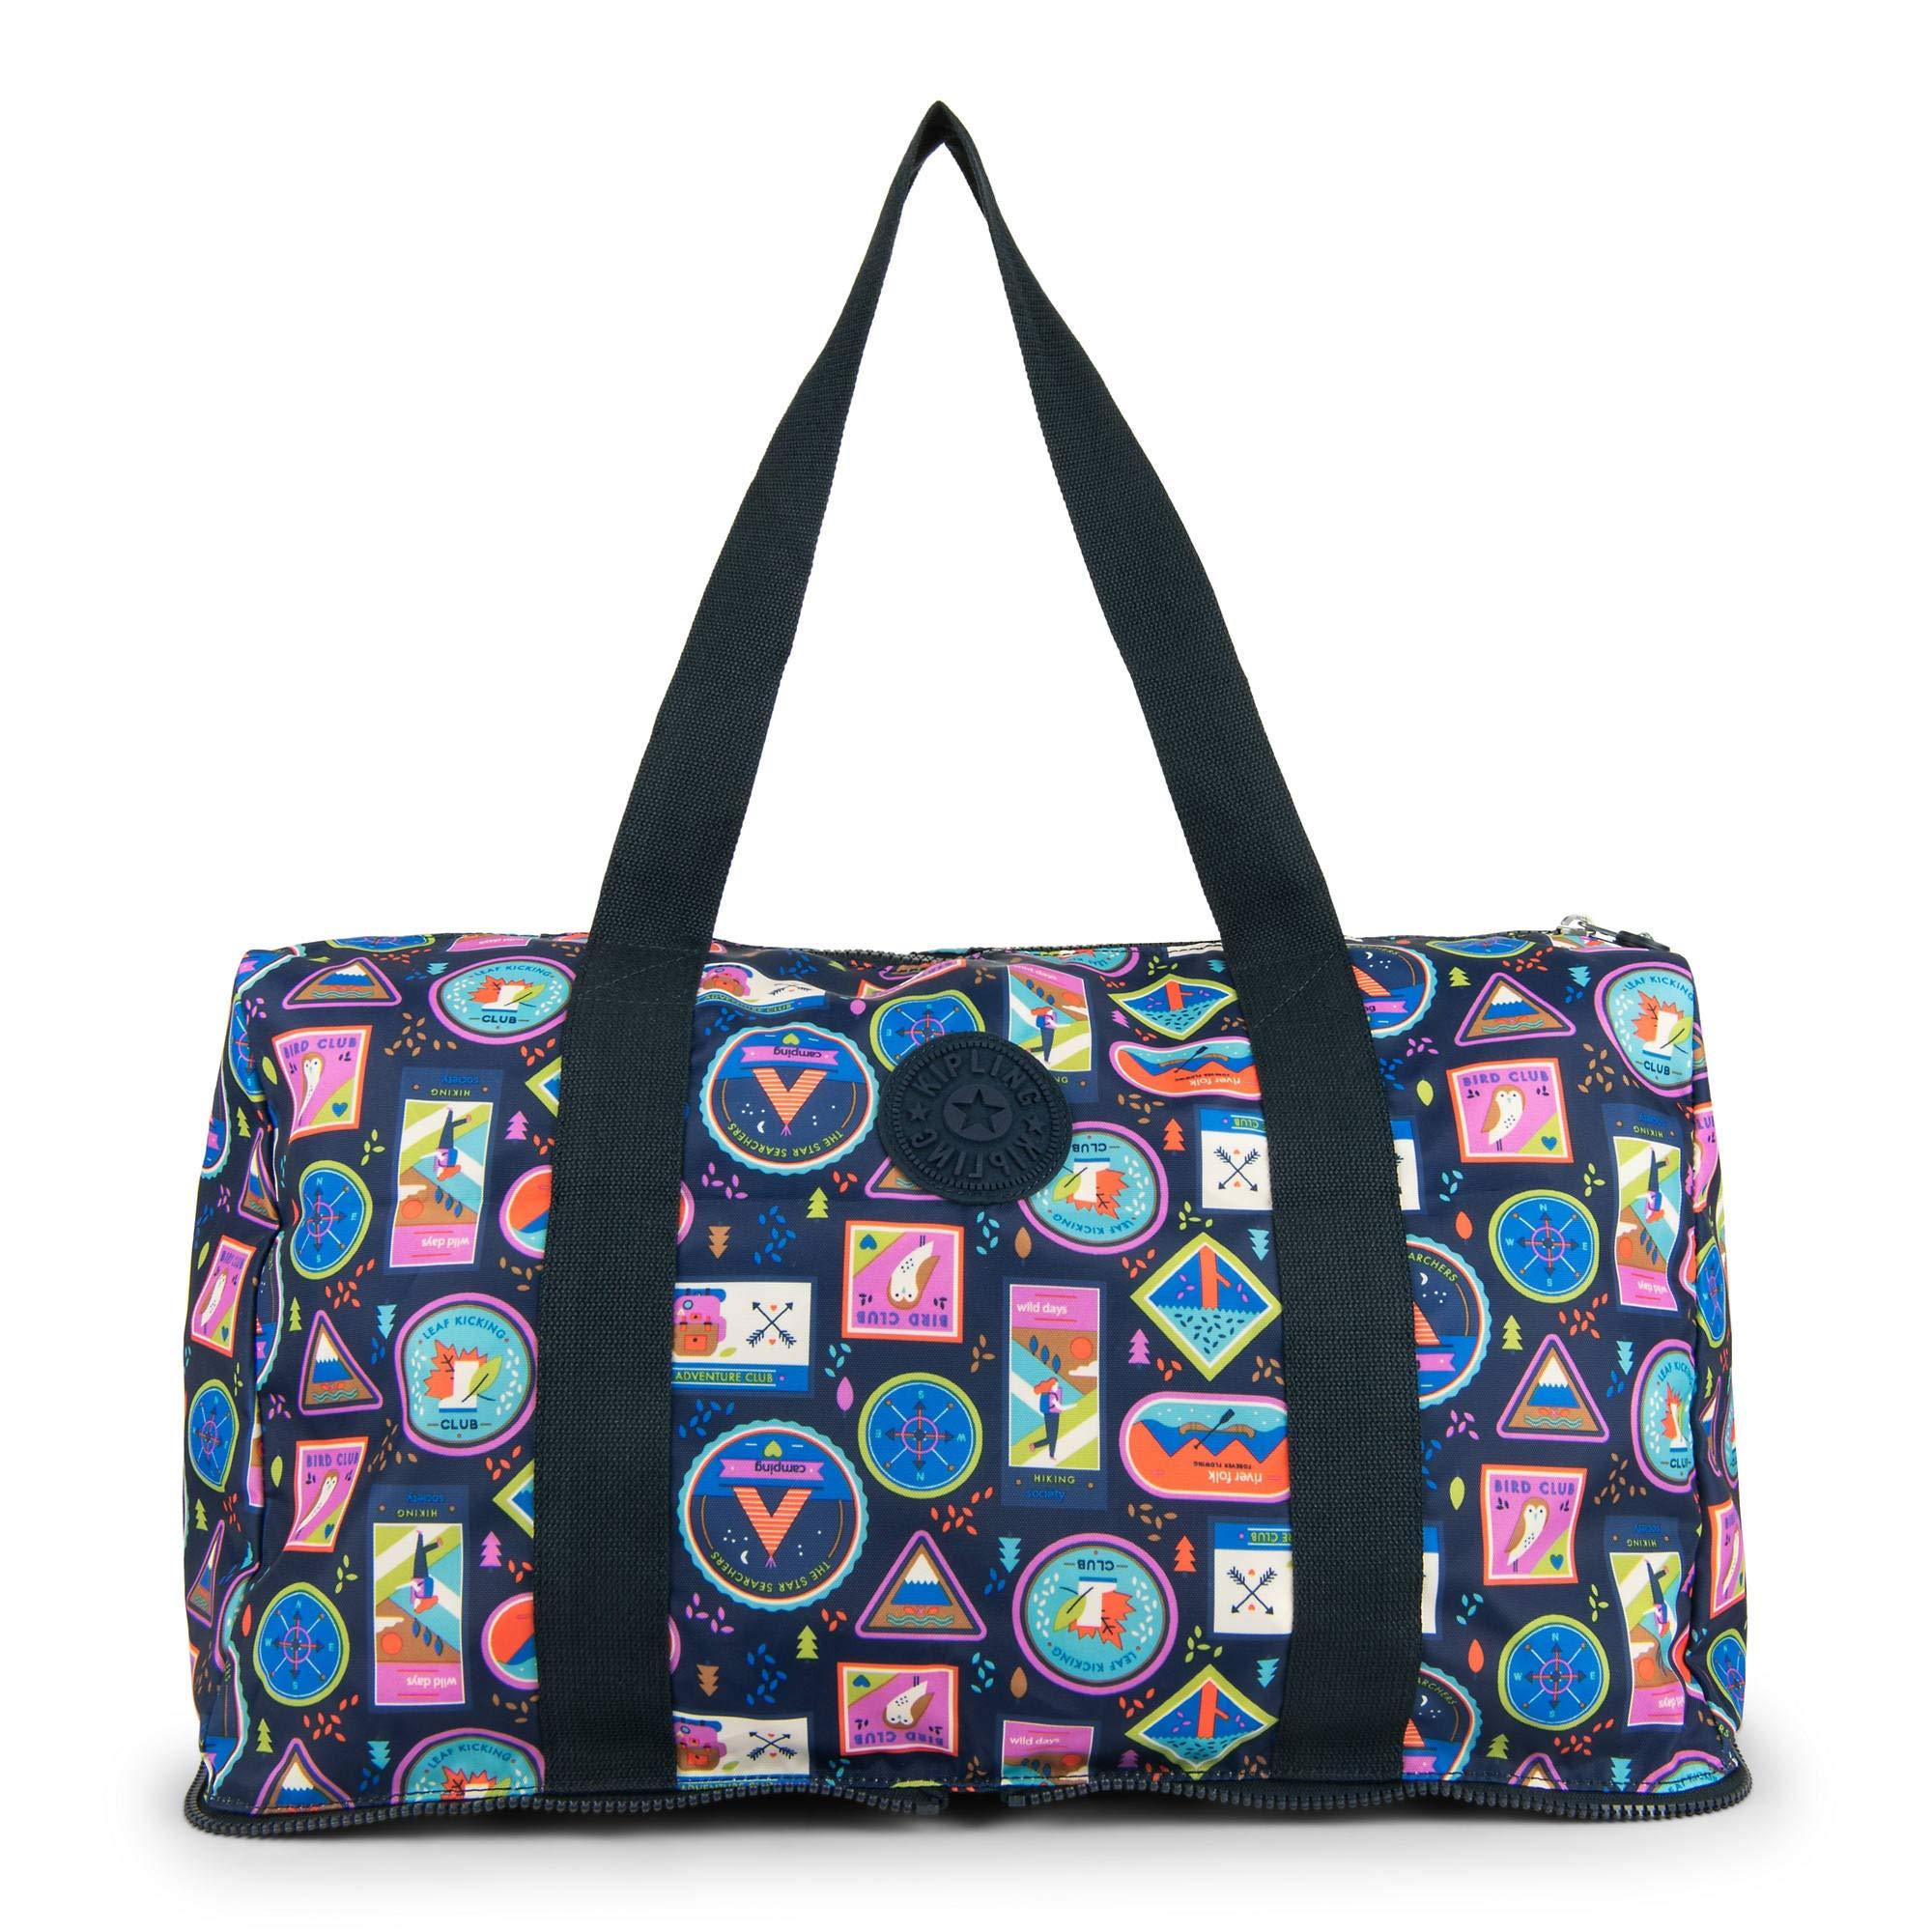 Kipling Honest Foldable Duffel Essential Travel Bag, Wandering Road